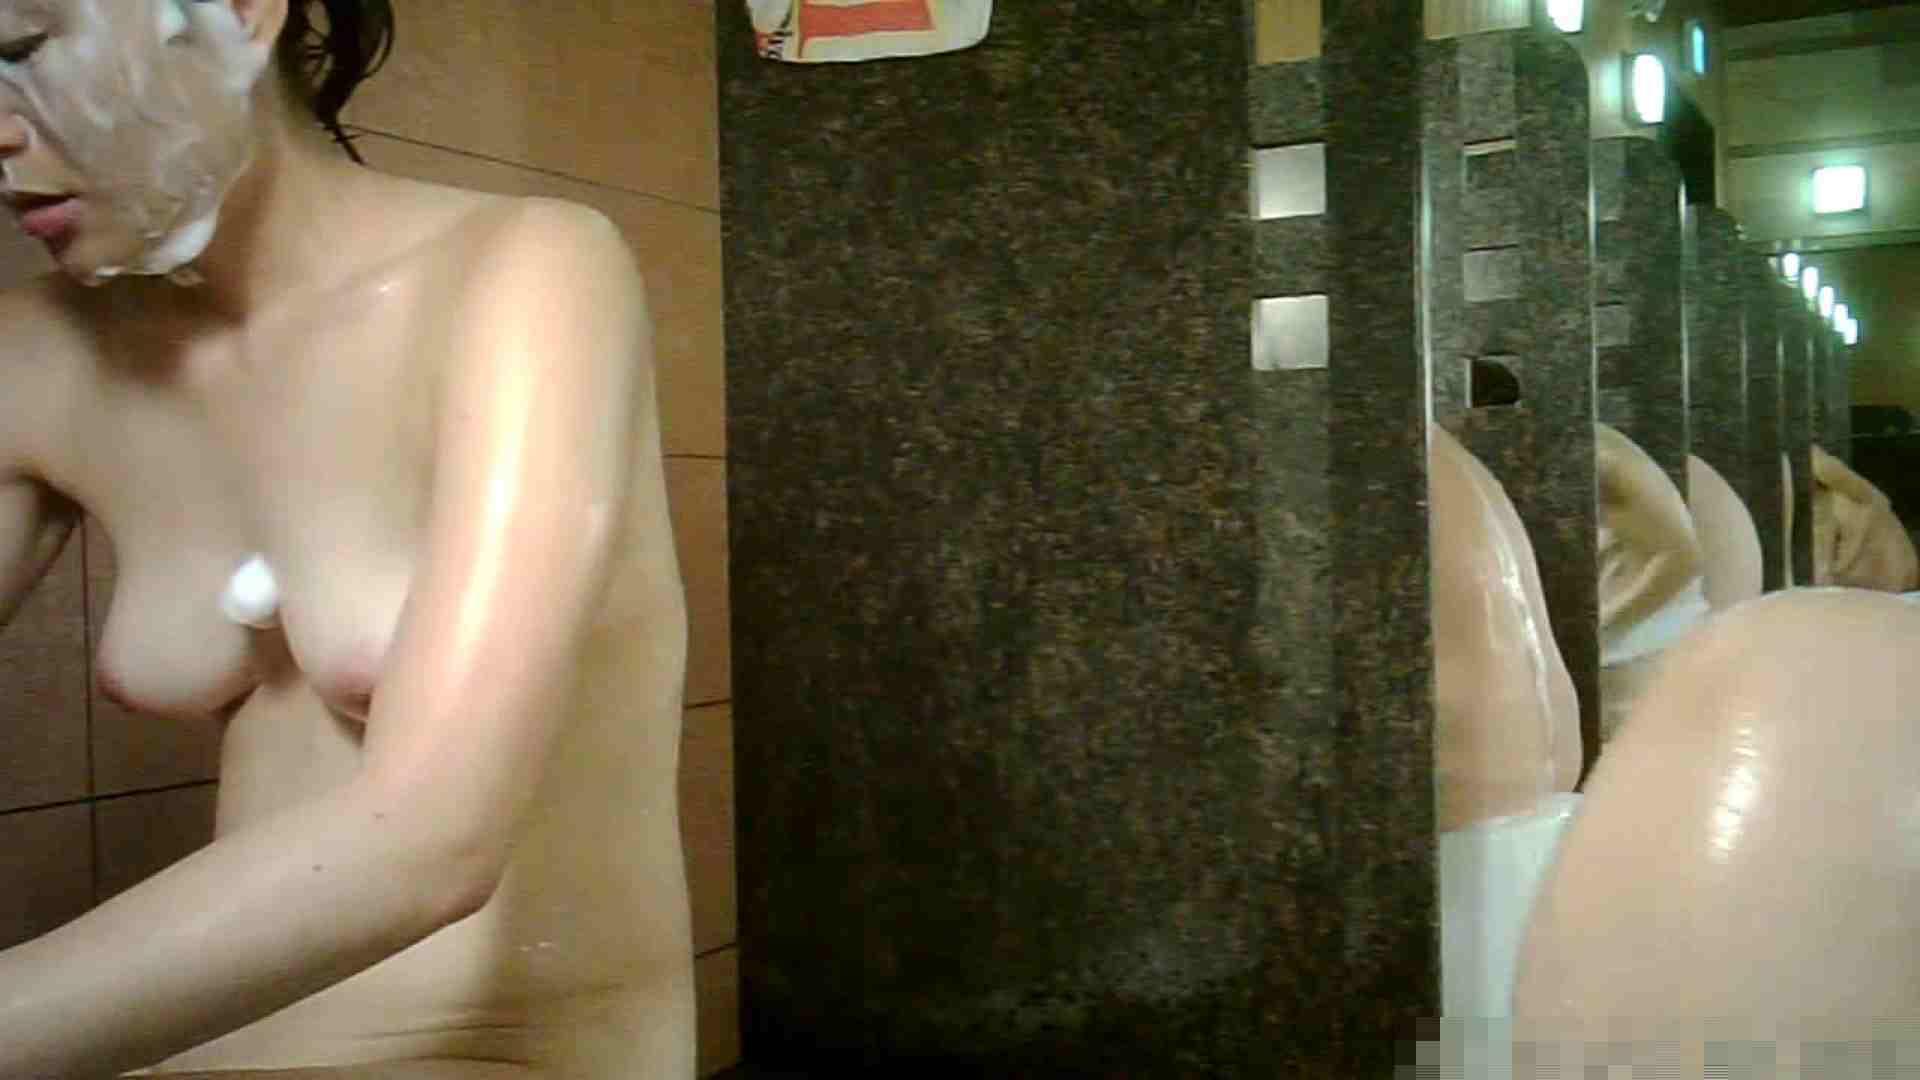 No.1 洗い場!!とっても綺麗な身体のお女市さん、乳首も綺麗です。 銭湯 | 潜入エロ調査  23連発 23